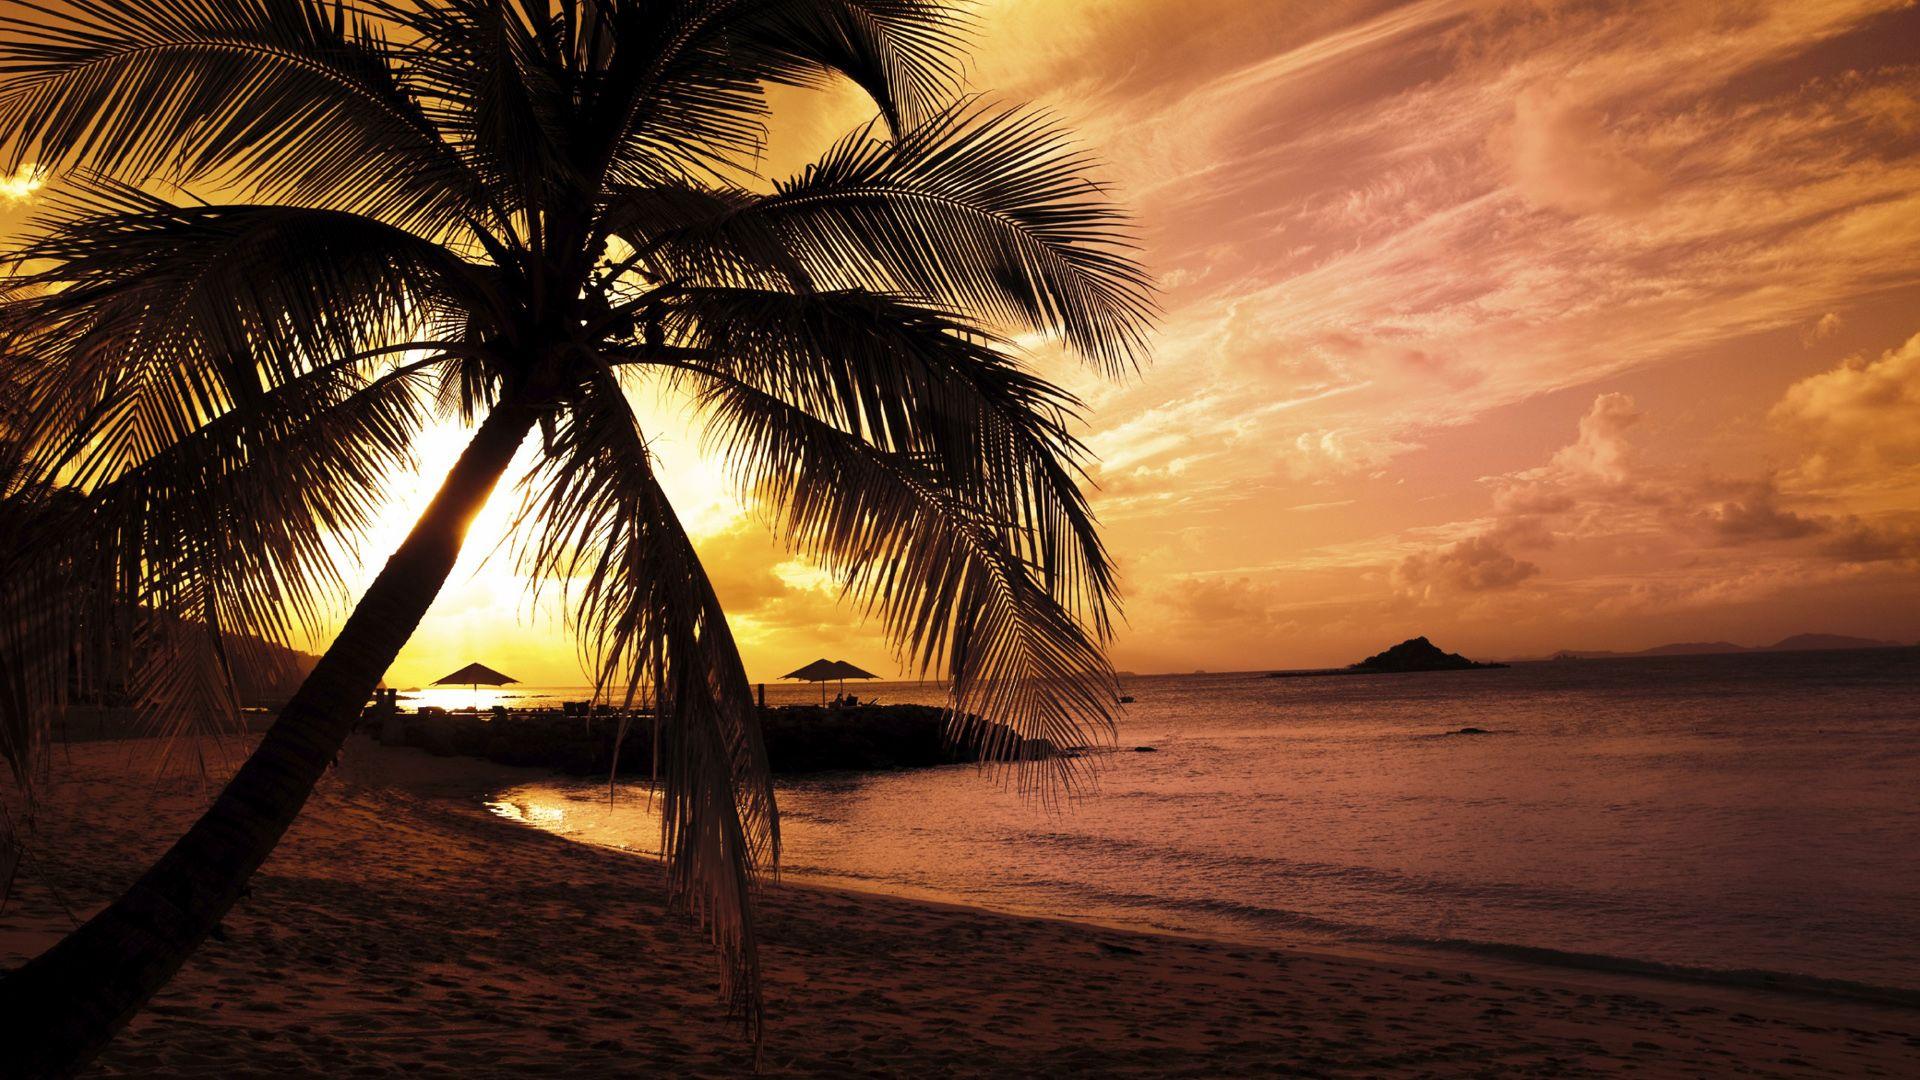 hawaii beach night wallpaper   1920x1080   #35145